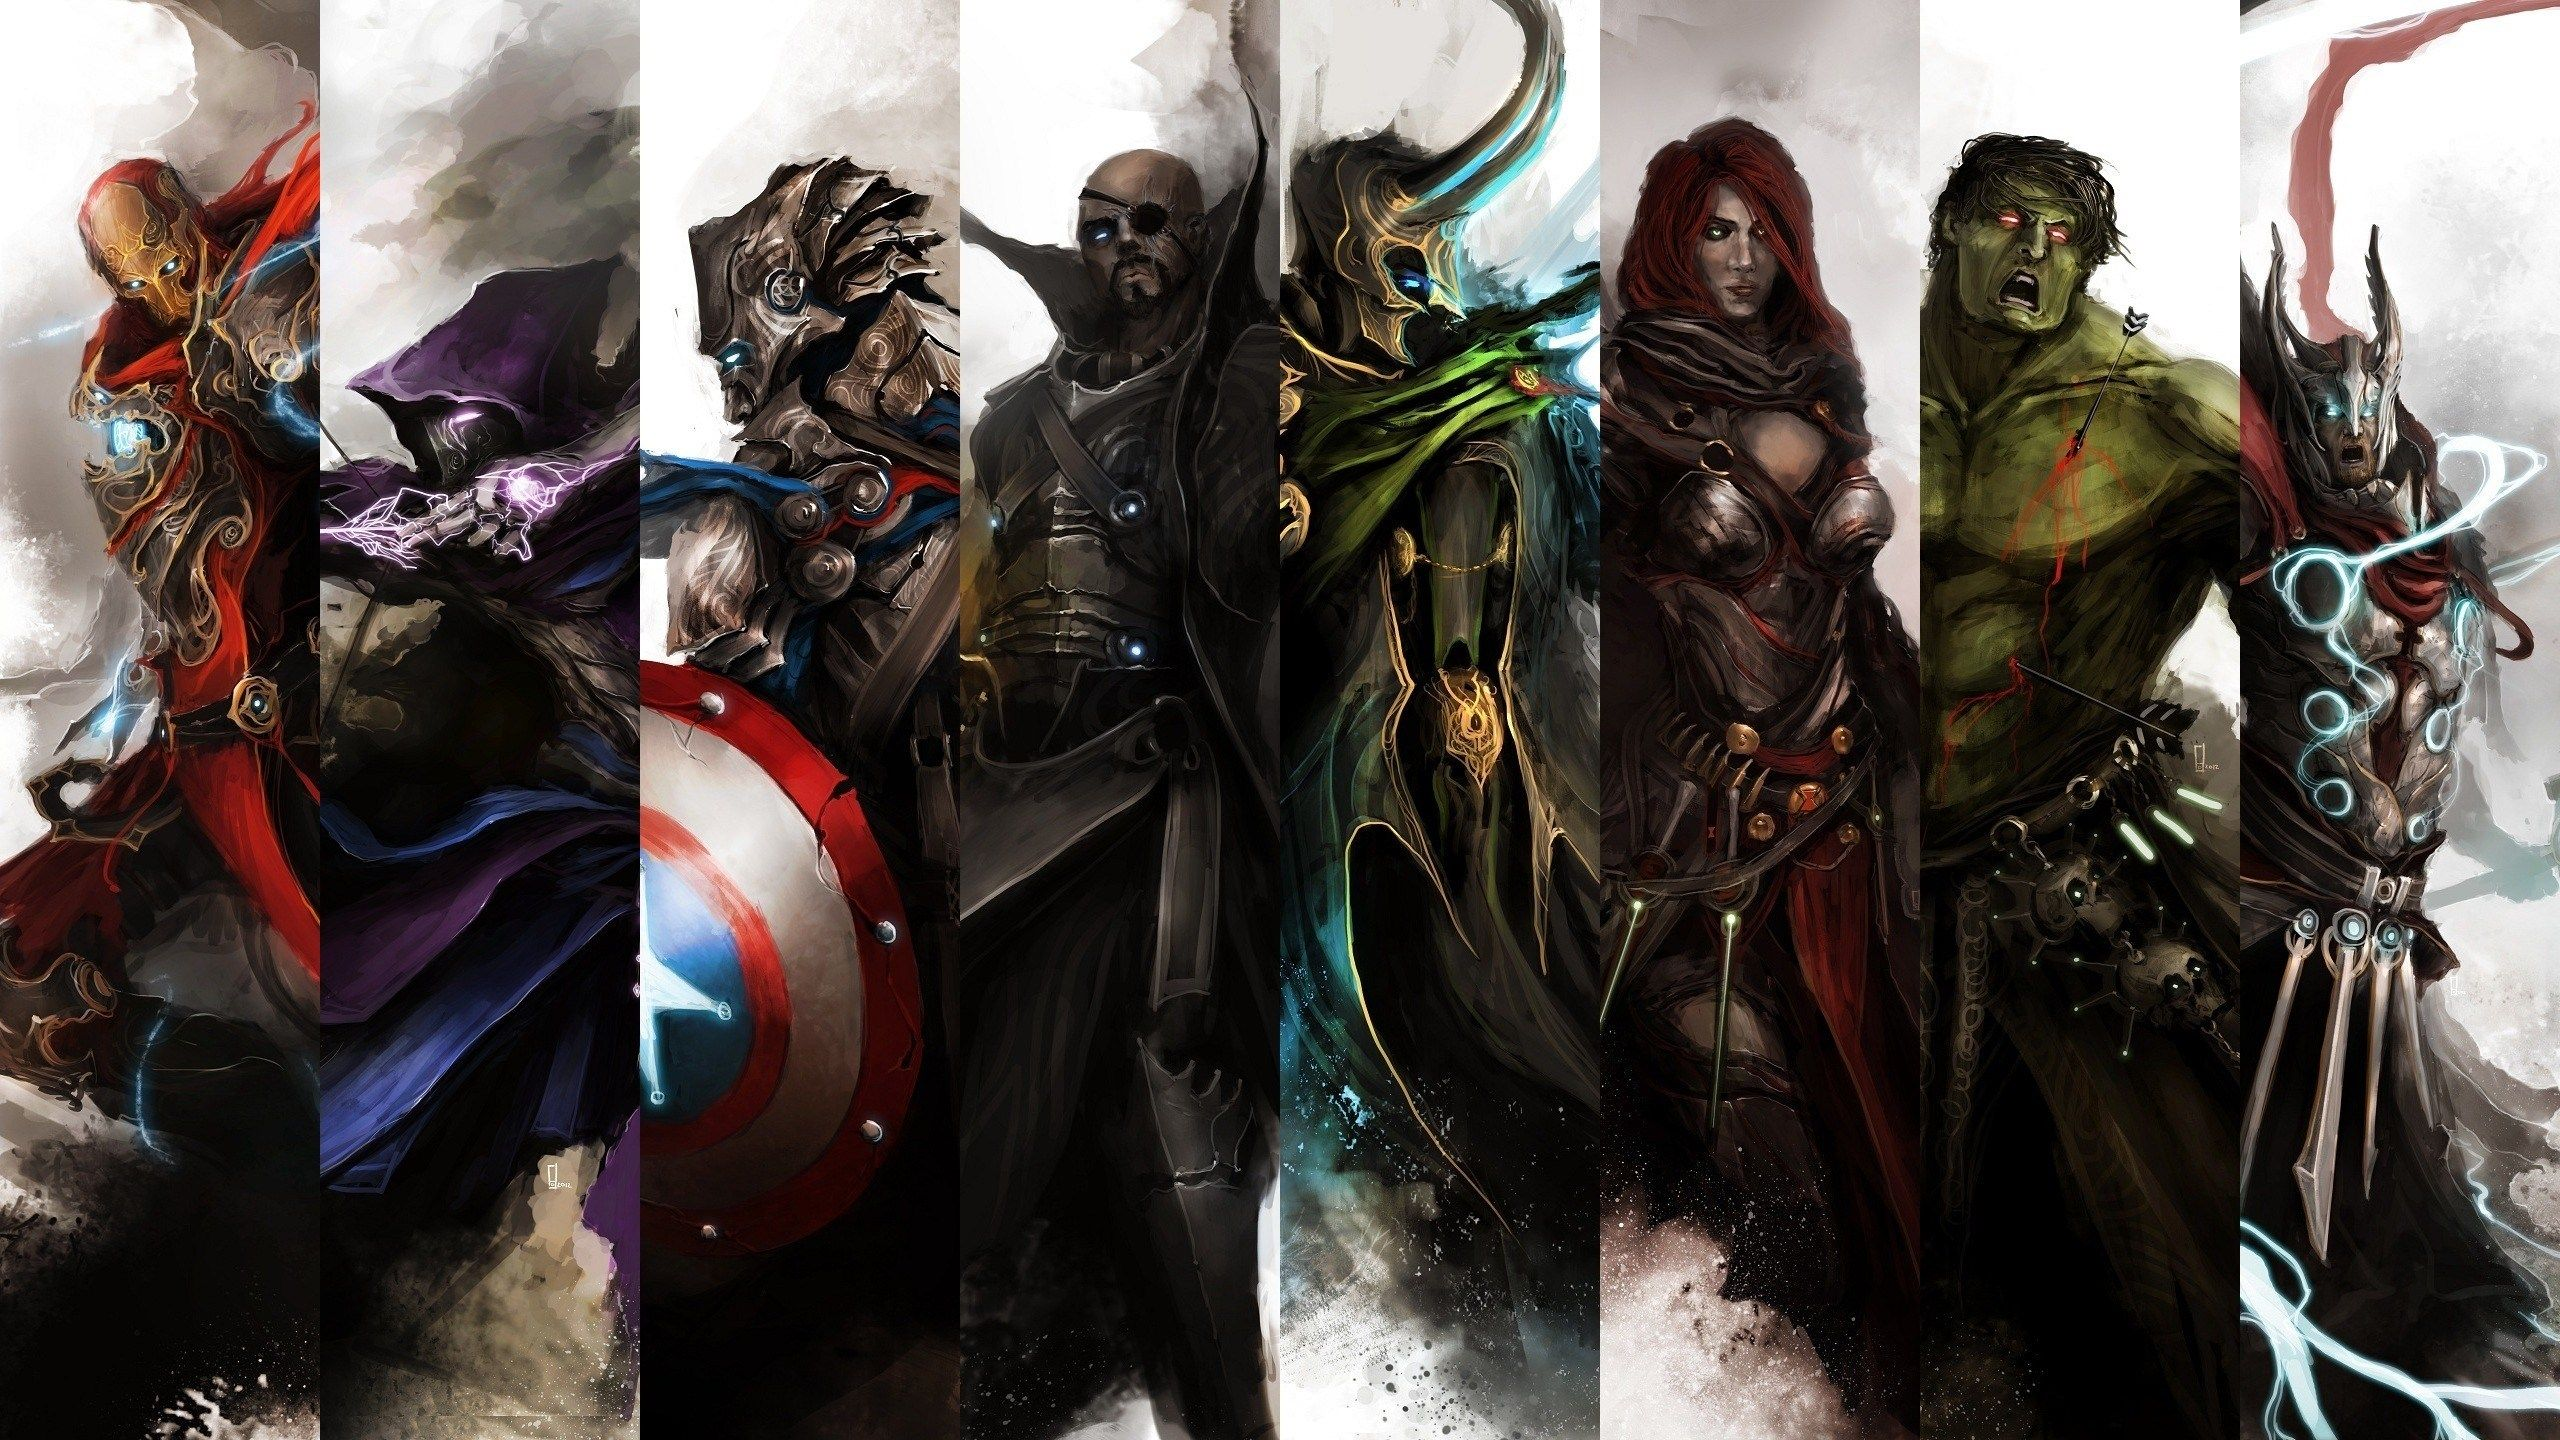 Good Wallpaper Marvel Loki - 78bd18c471bd19f6d2491825f7362c96  Picture_504279.jpg